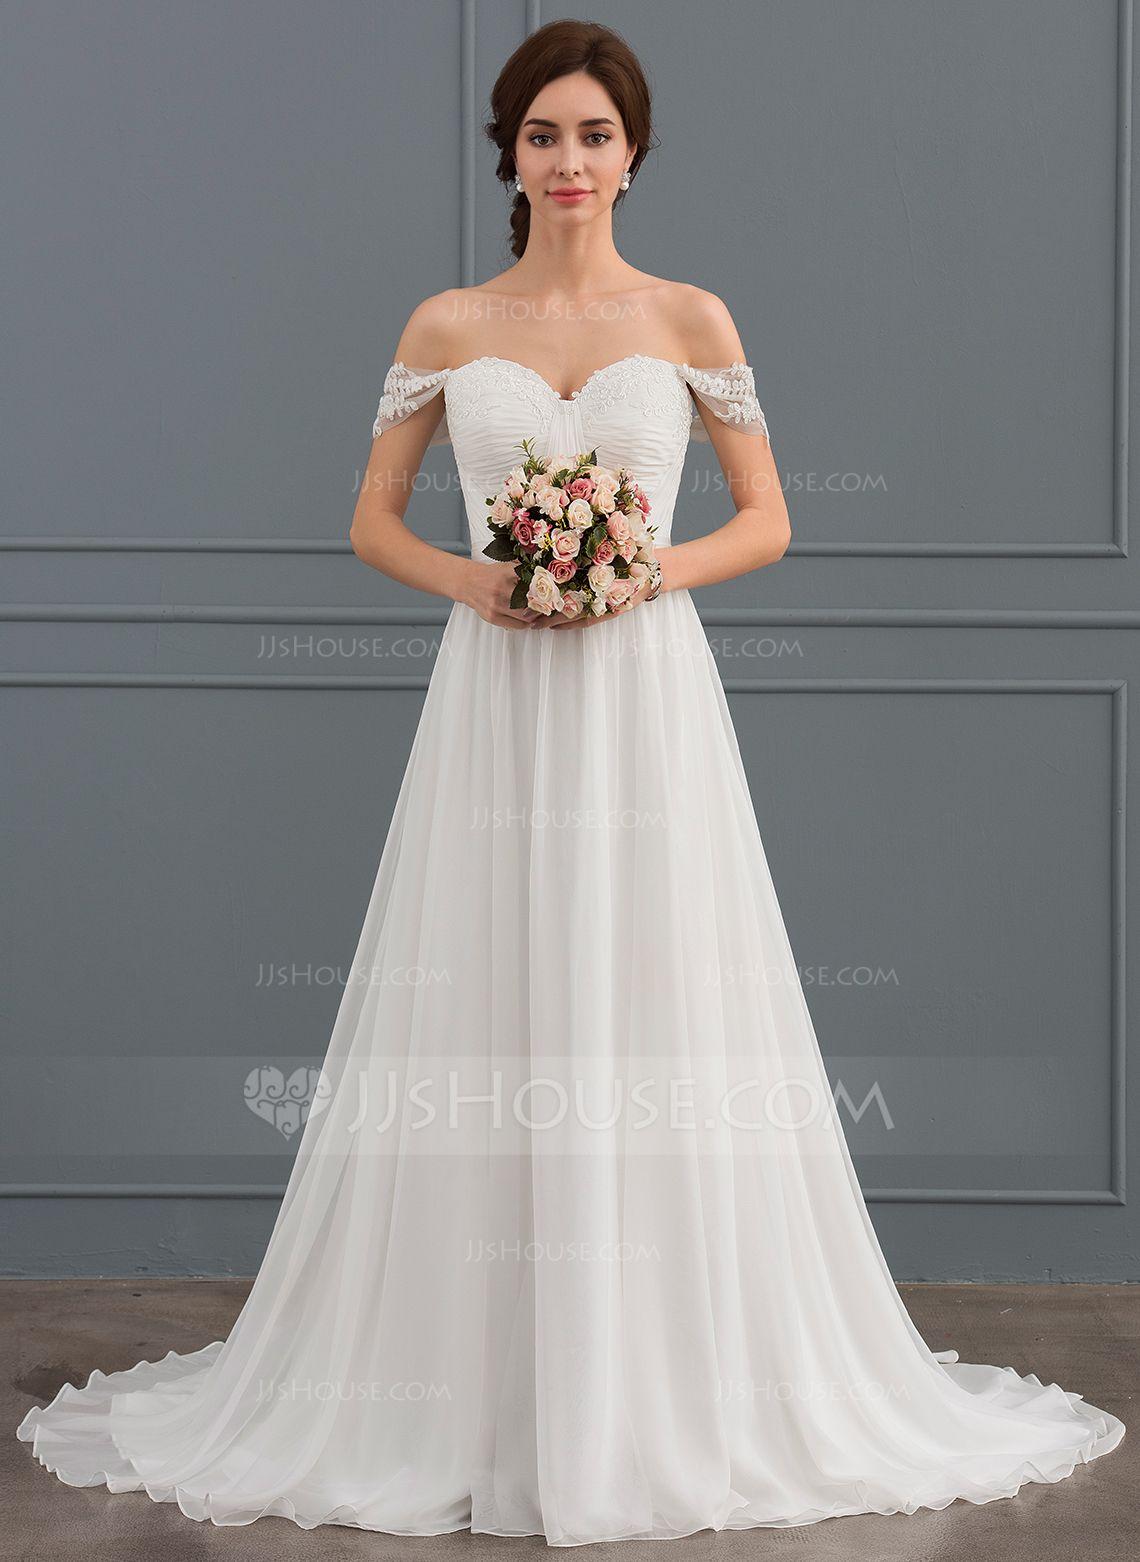 Us 209 00 A Line Princess Off The Shoulder Sweep Train Chiffon Lace Wedding Dress With Ruffle Jj S House Wedding Event Dresses Ruffle Wedding Dress Wedding Dress Styles [ 1562 x 1140 Pixel ]